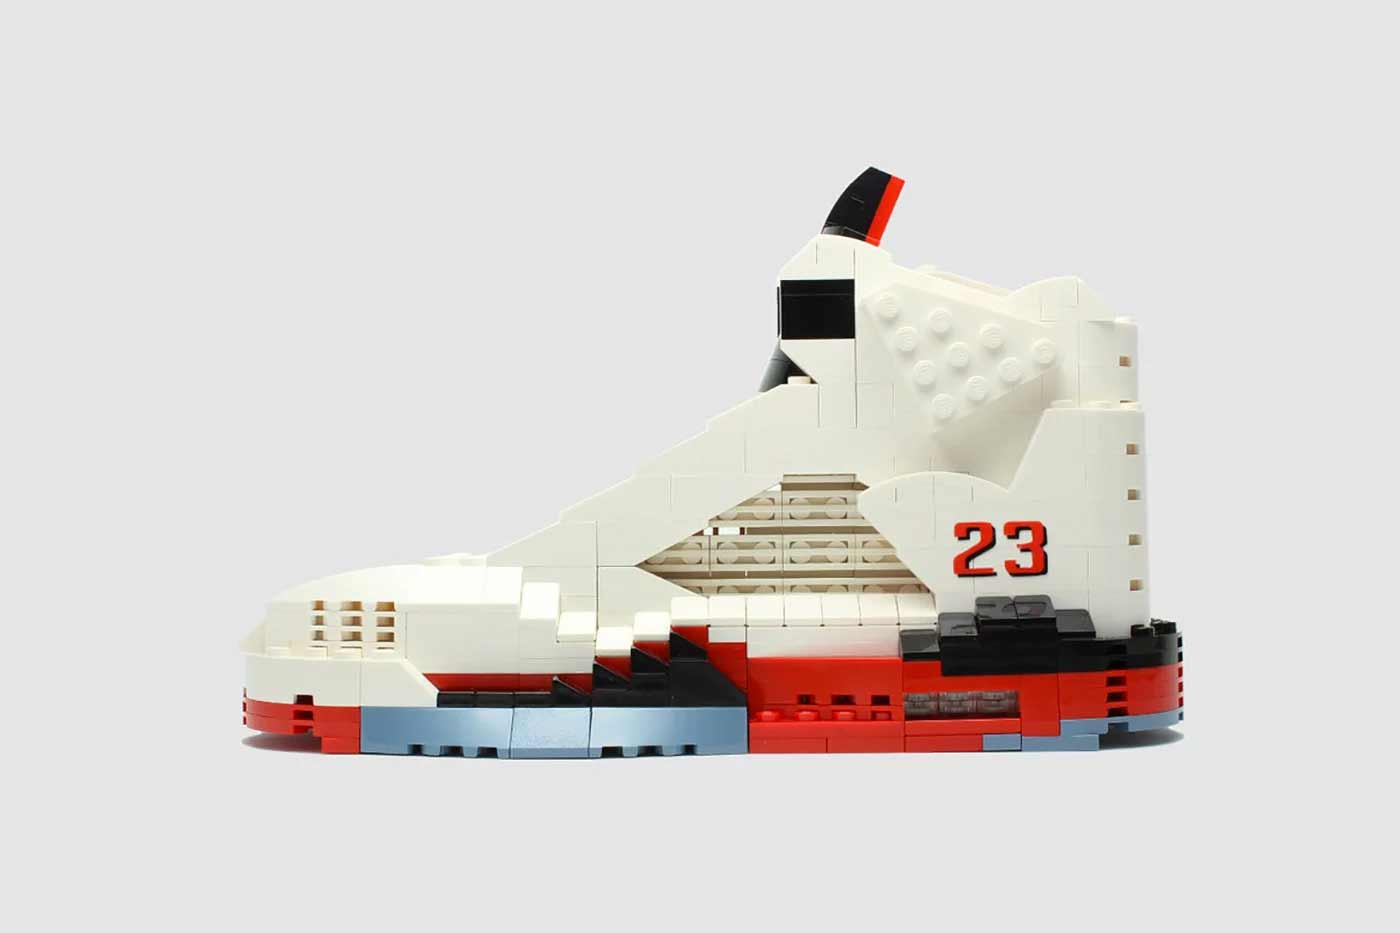 LEGO-Sneaker von Tom Yoo LEGO-Sneaker-Tom-Yoo_06